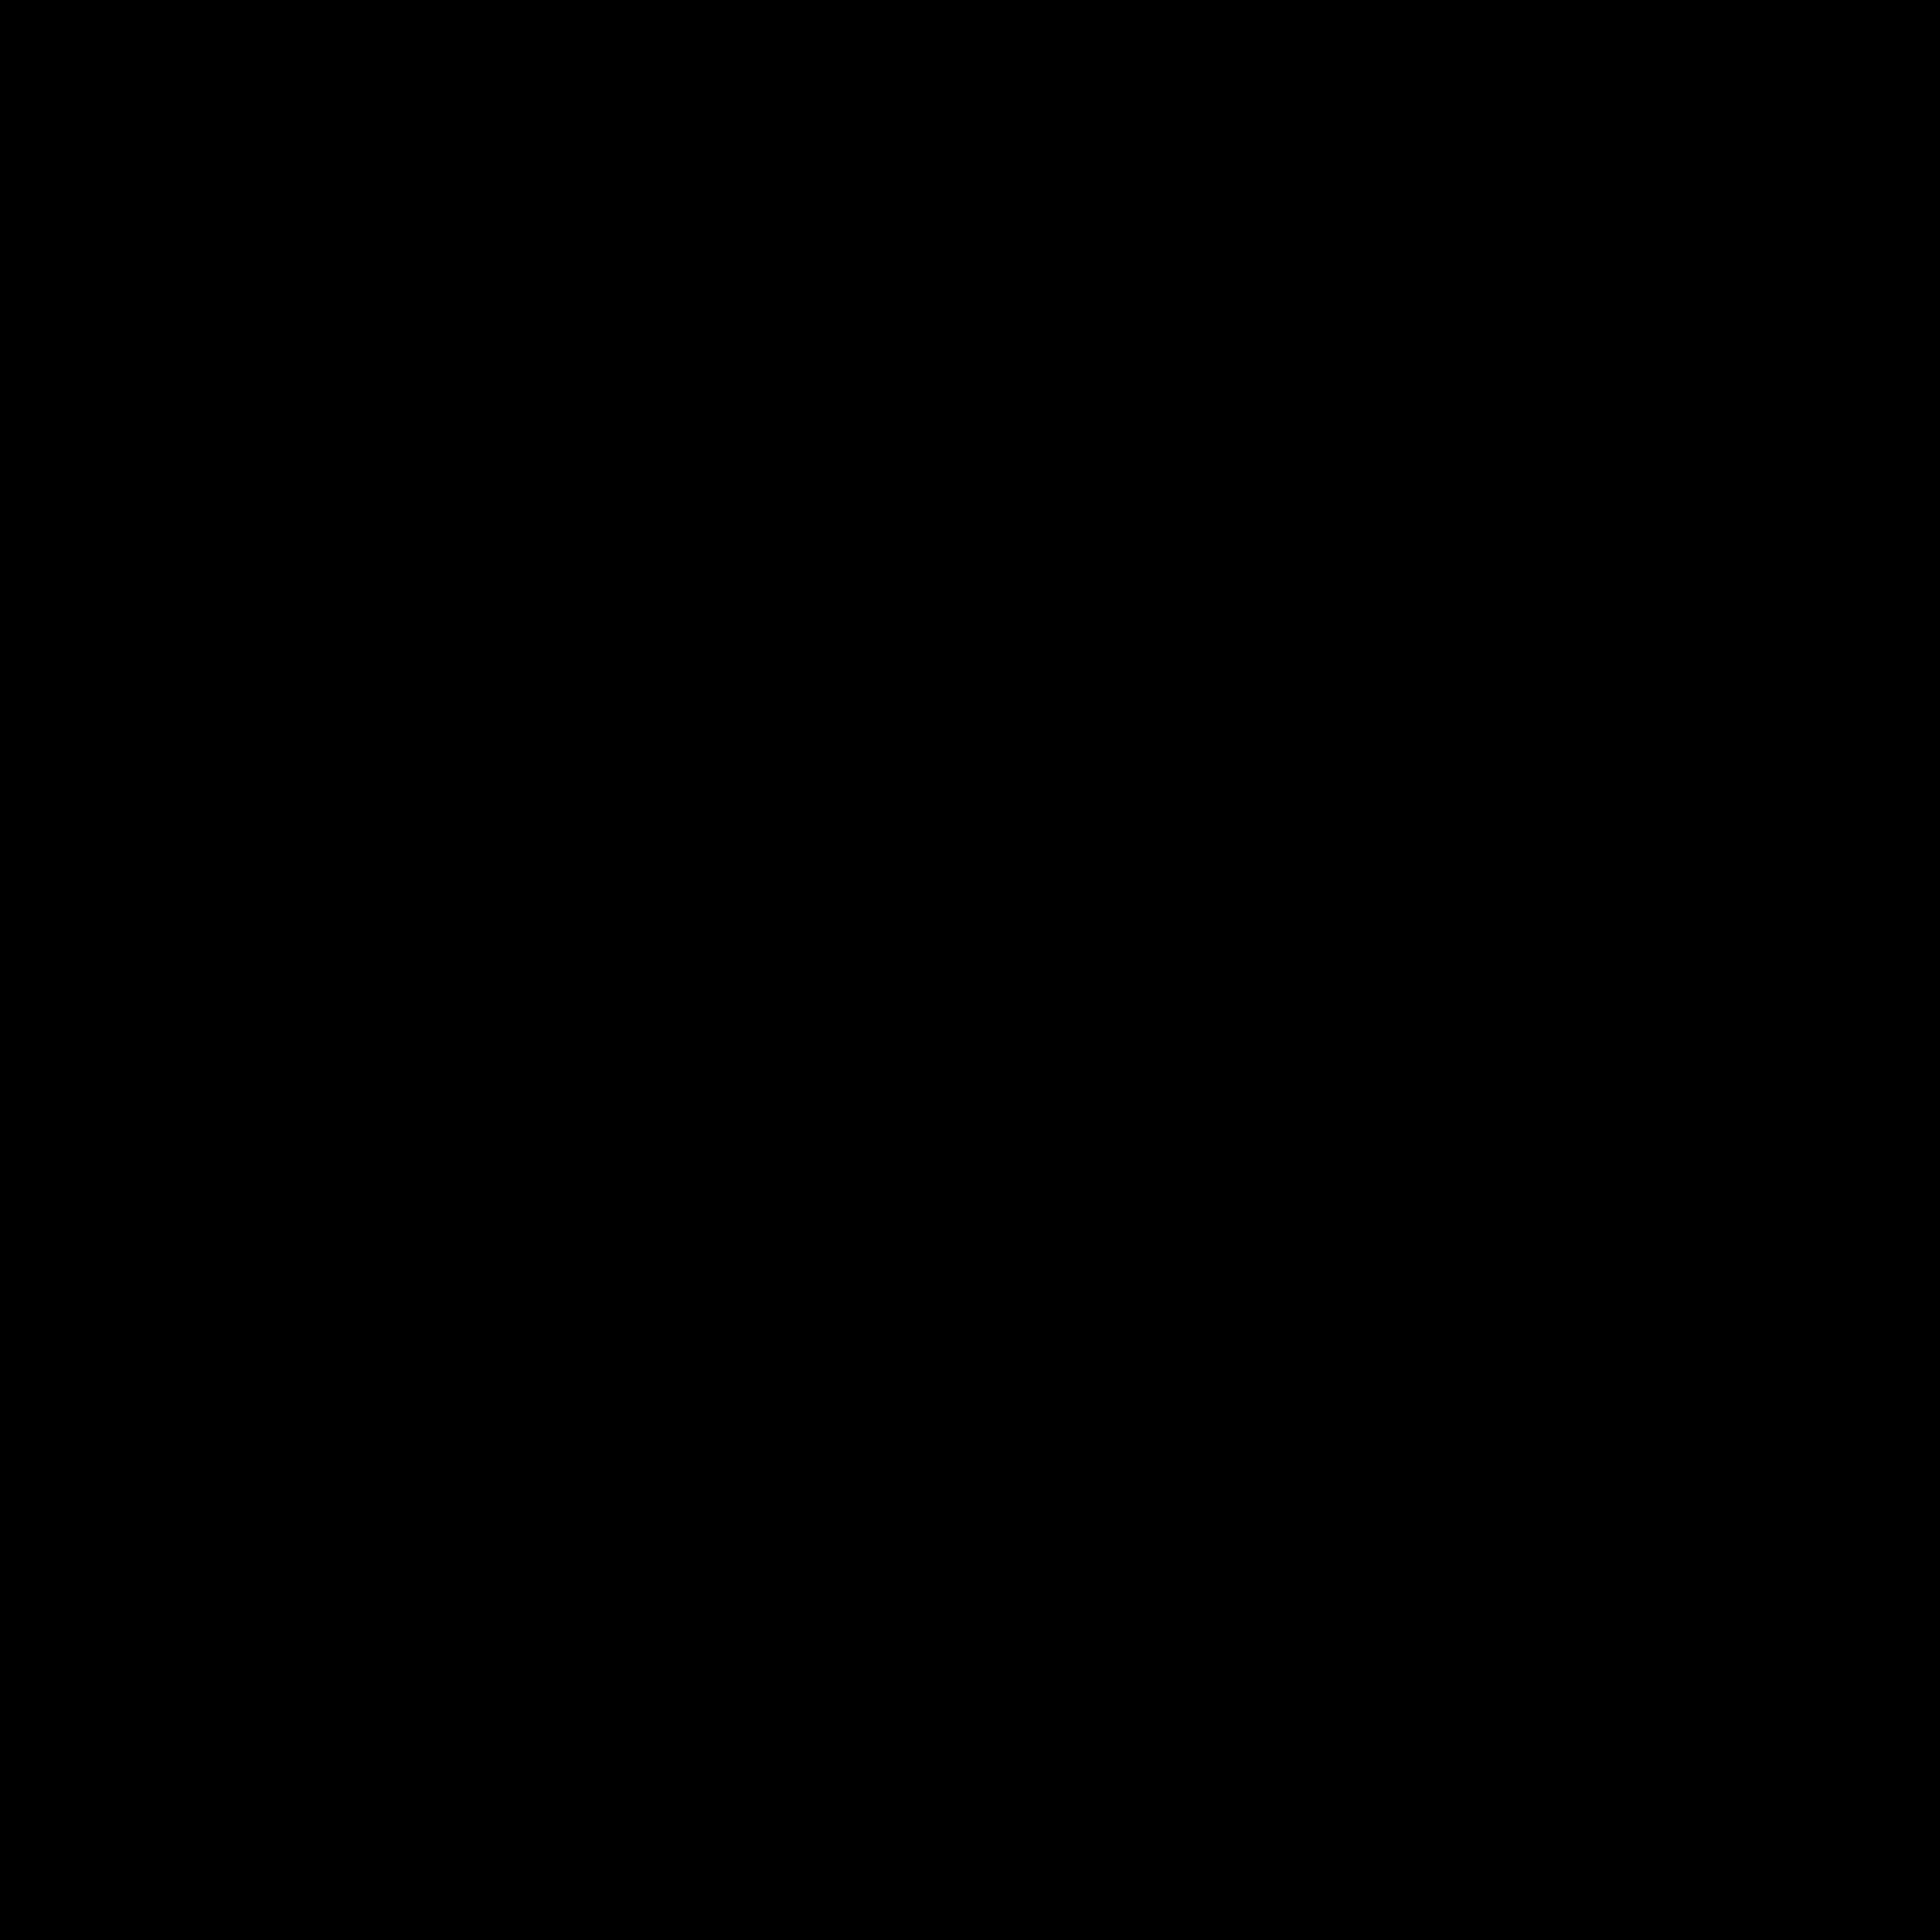 American cancer society 4114 logo png transparent svg vector american cancer society 4114 logo png transparent toneelgroepblik Choice Image